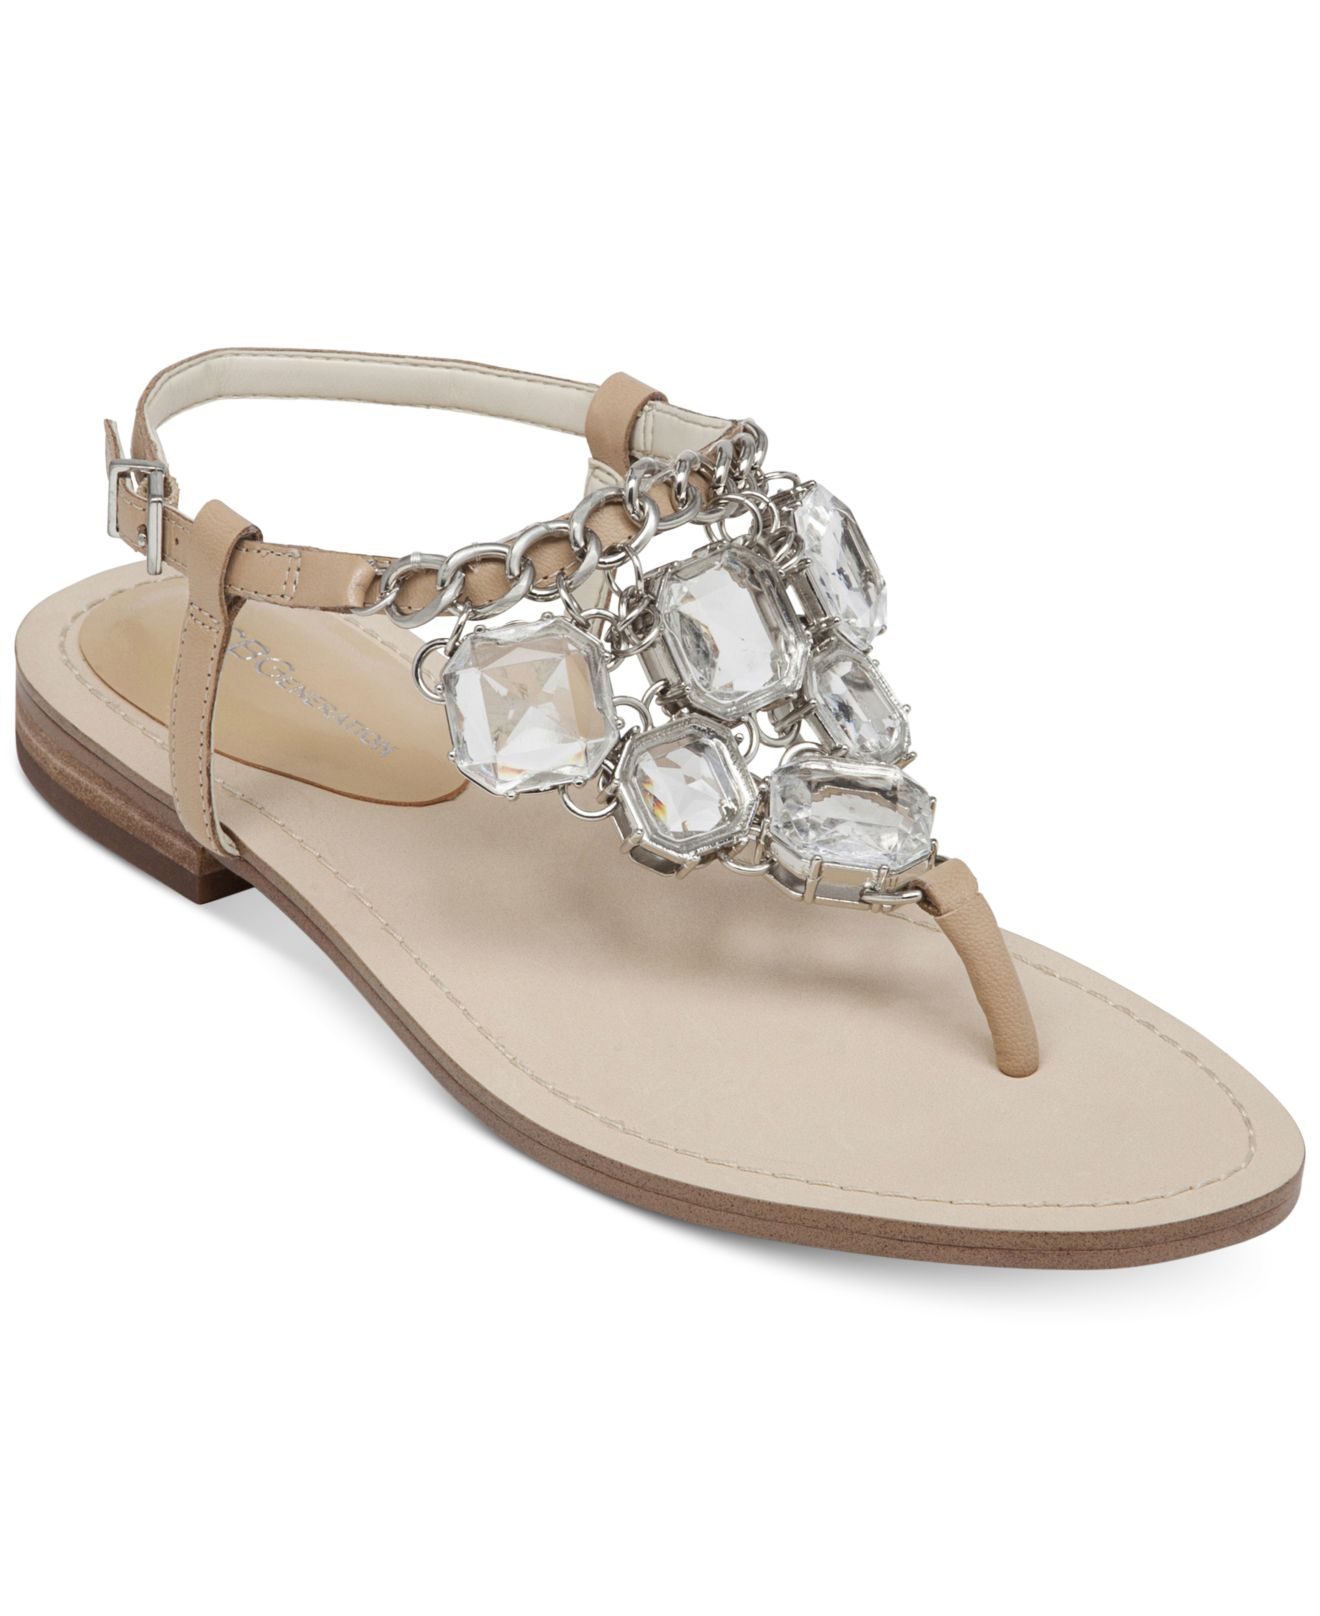 6d7de40c7 Lyst - BCBGeneration Baila Bling Flat Sandals in Natural